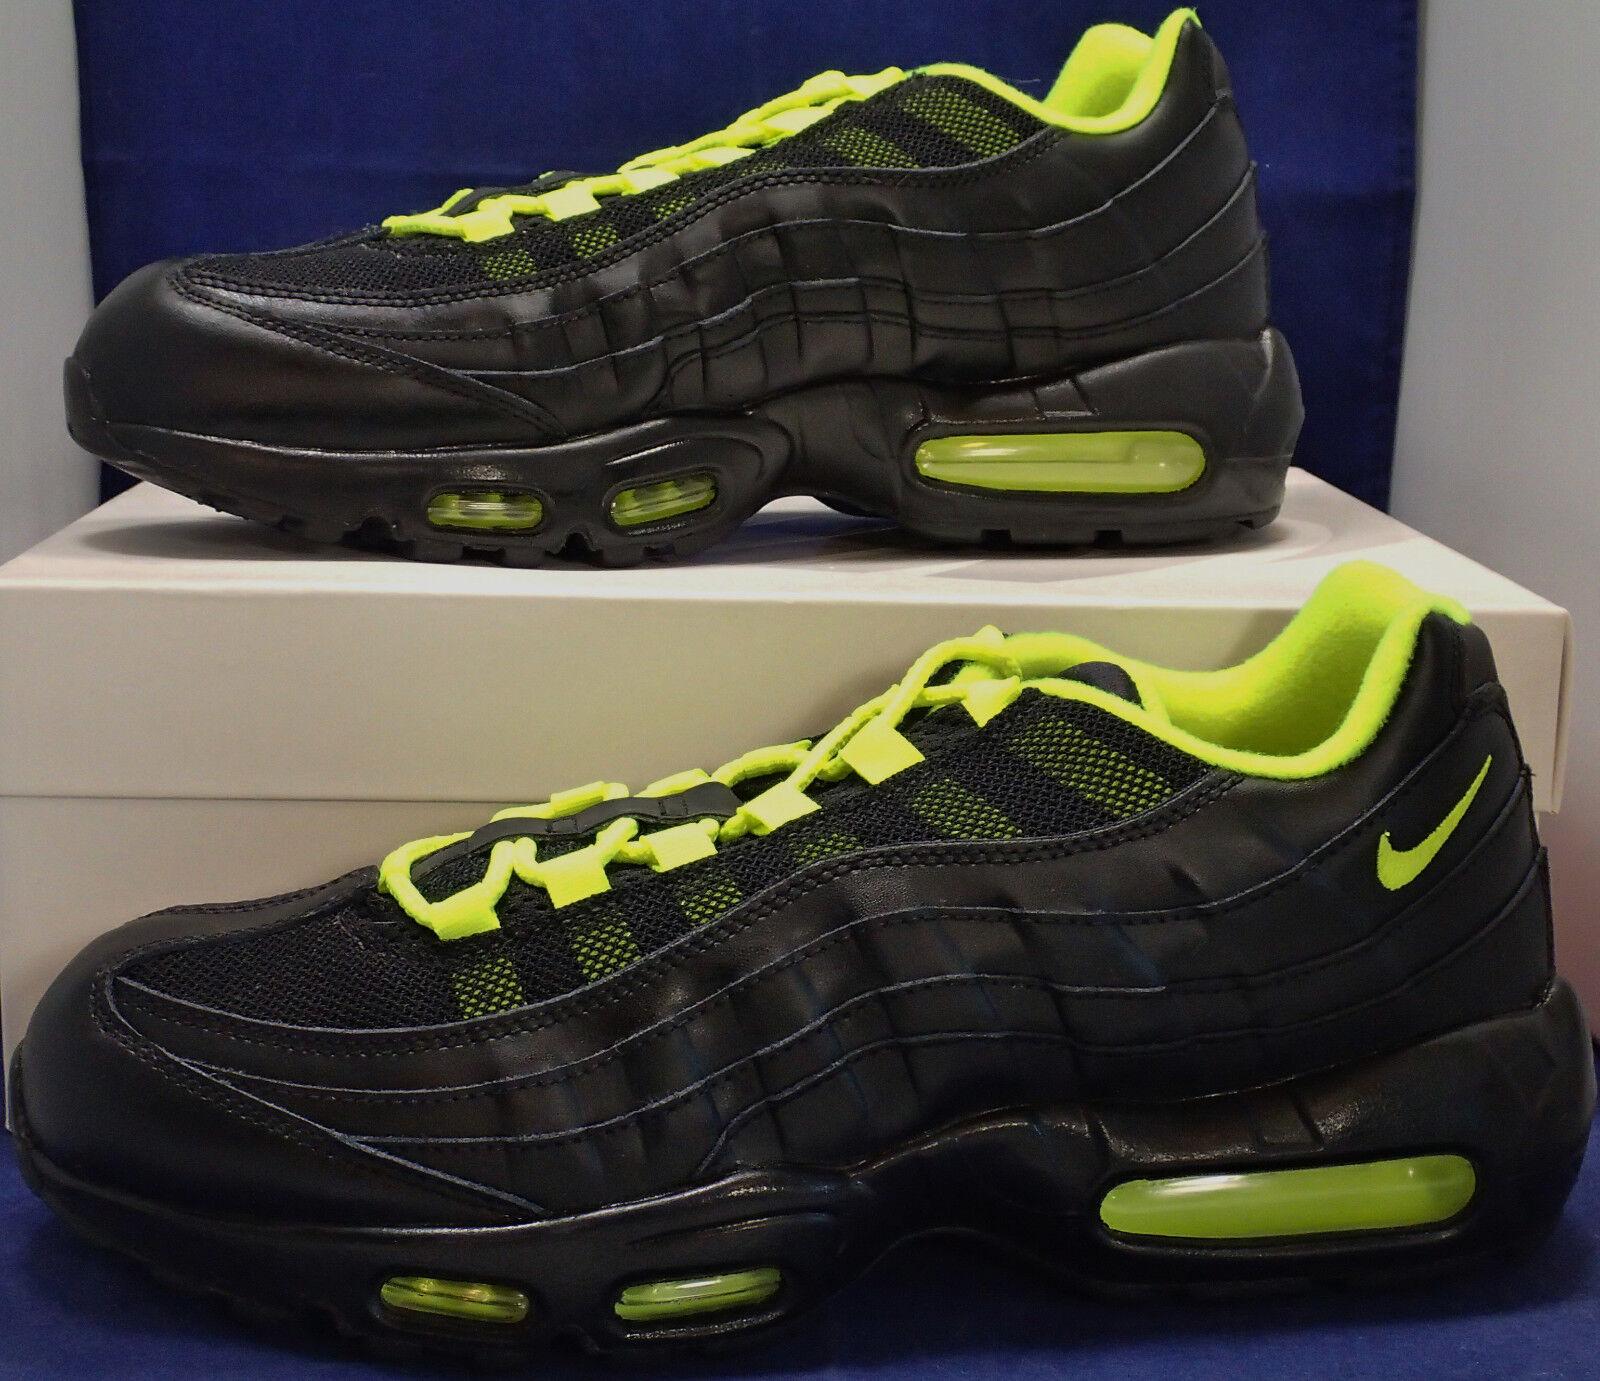 Nike Air Max 95 iD Black Volt SZ 10.5 ( 818592-994 )